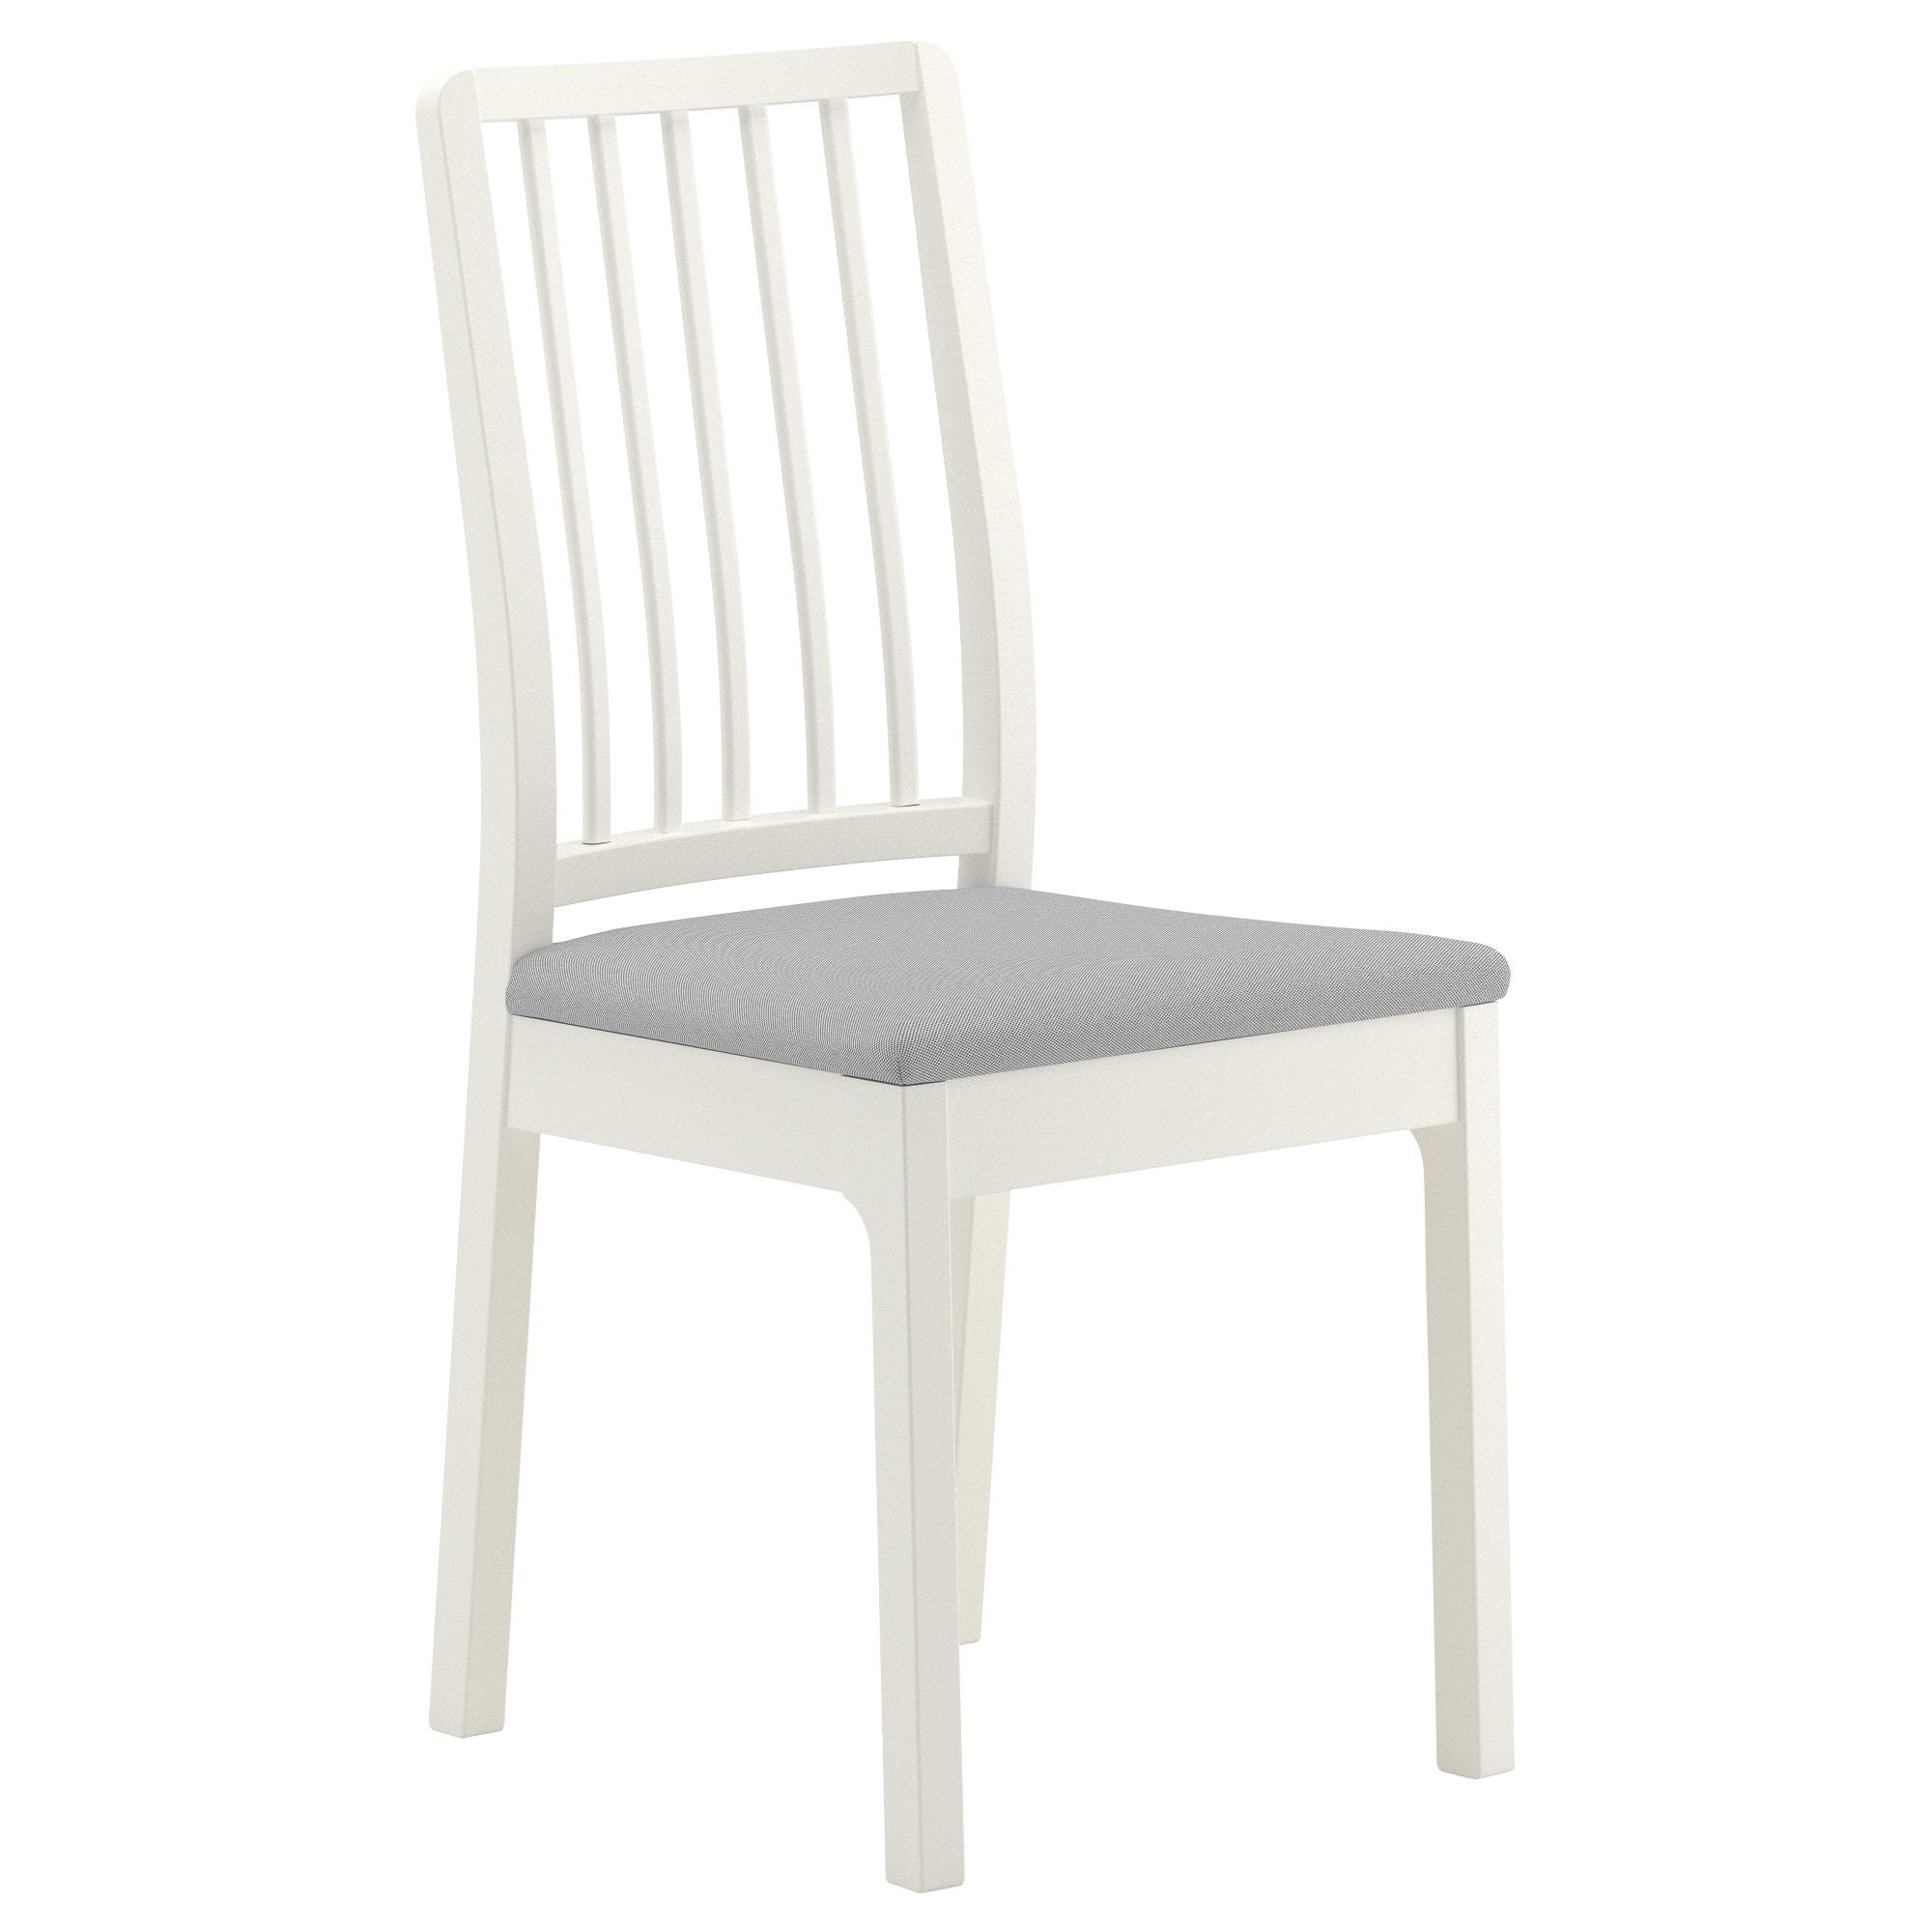 Sillas Ikea Kvdd Ekedalen Silla Blanco orrsta Gris Claro Ikea